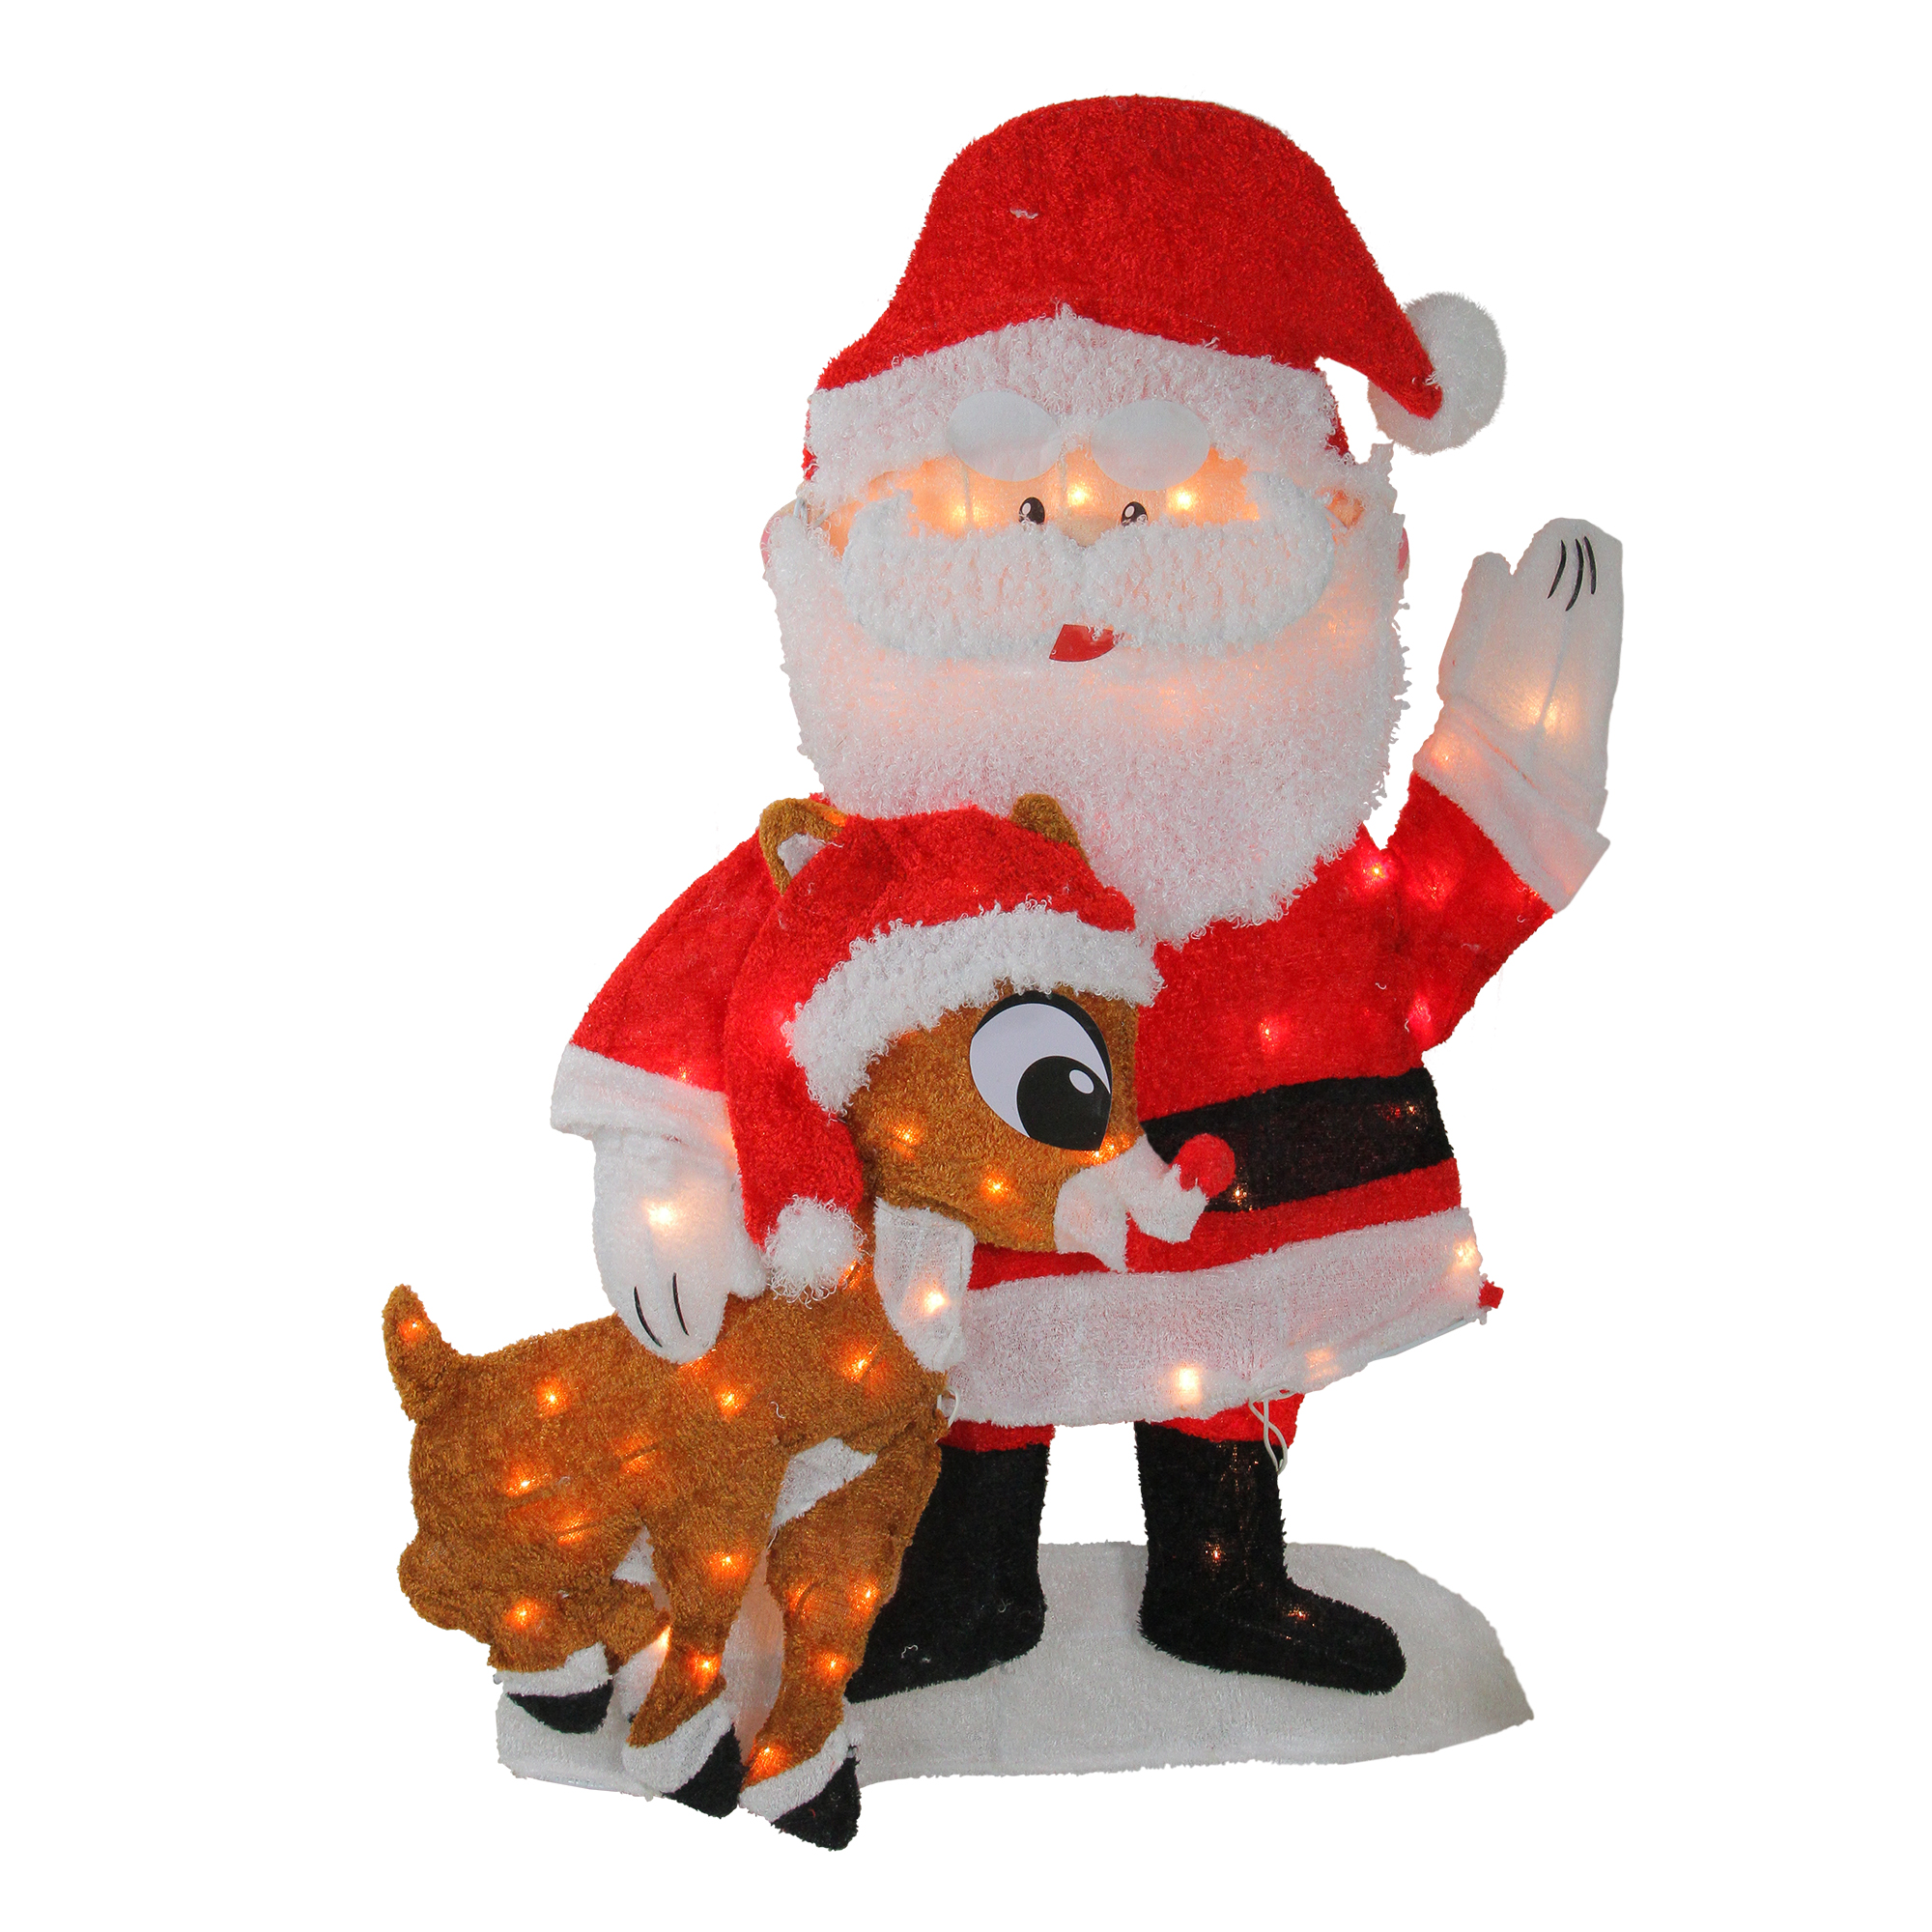 Northlight Waving Santa Claus and Rudolph Light Display